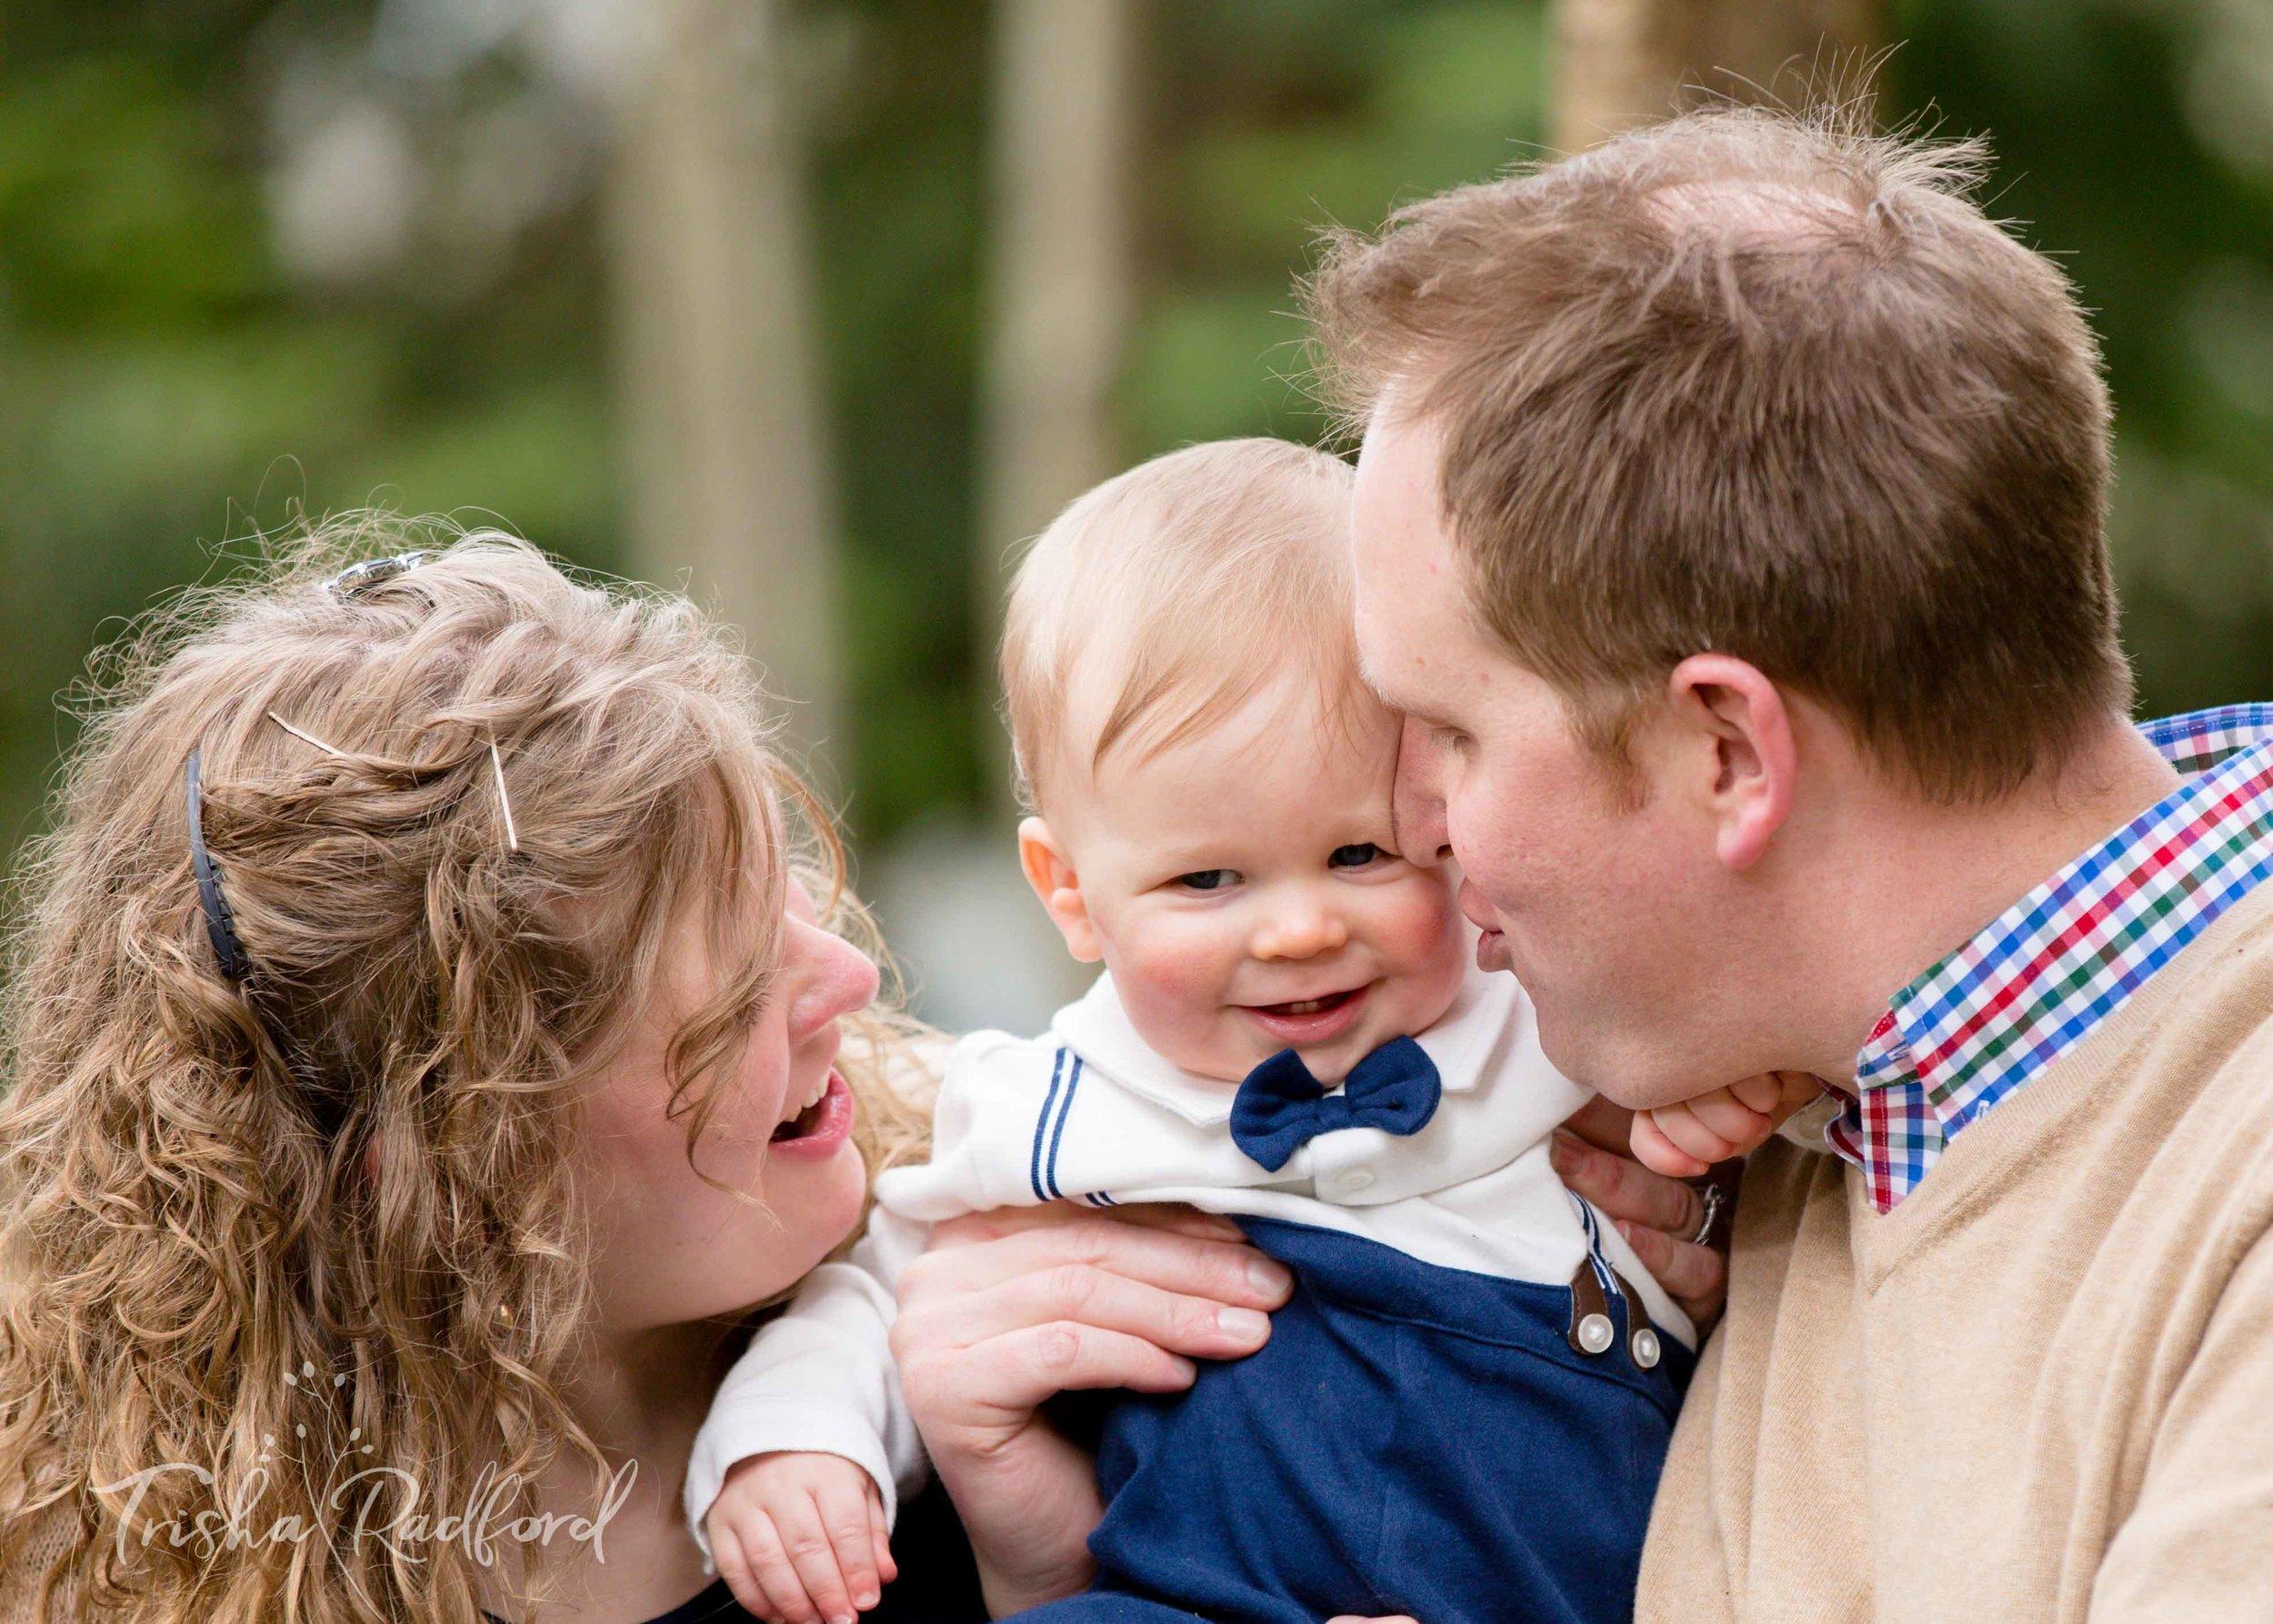 Family Photography, Mukilteo WA, Snohomish County Photographer